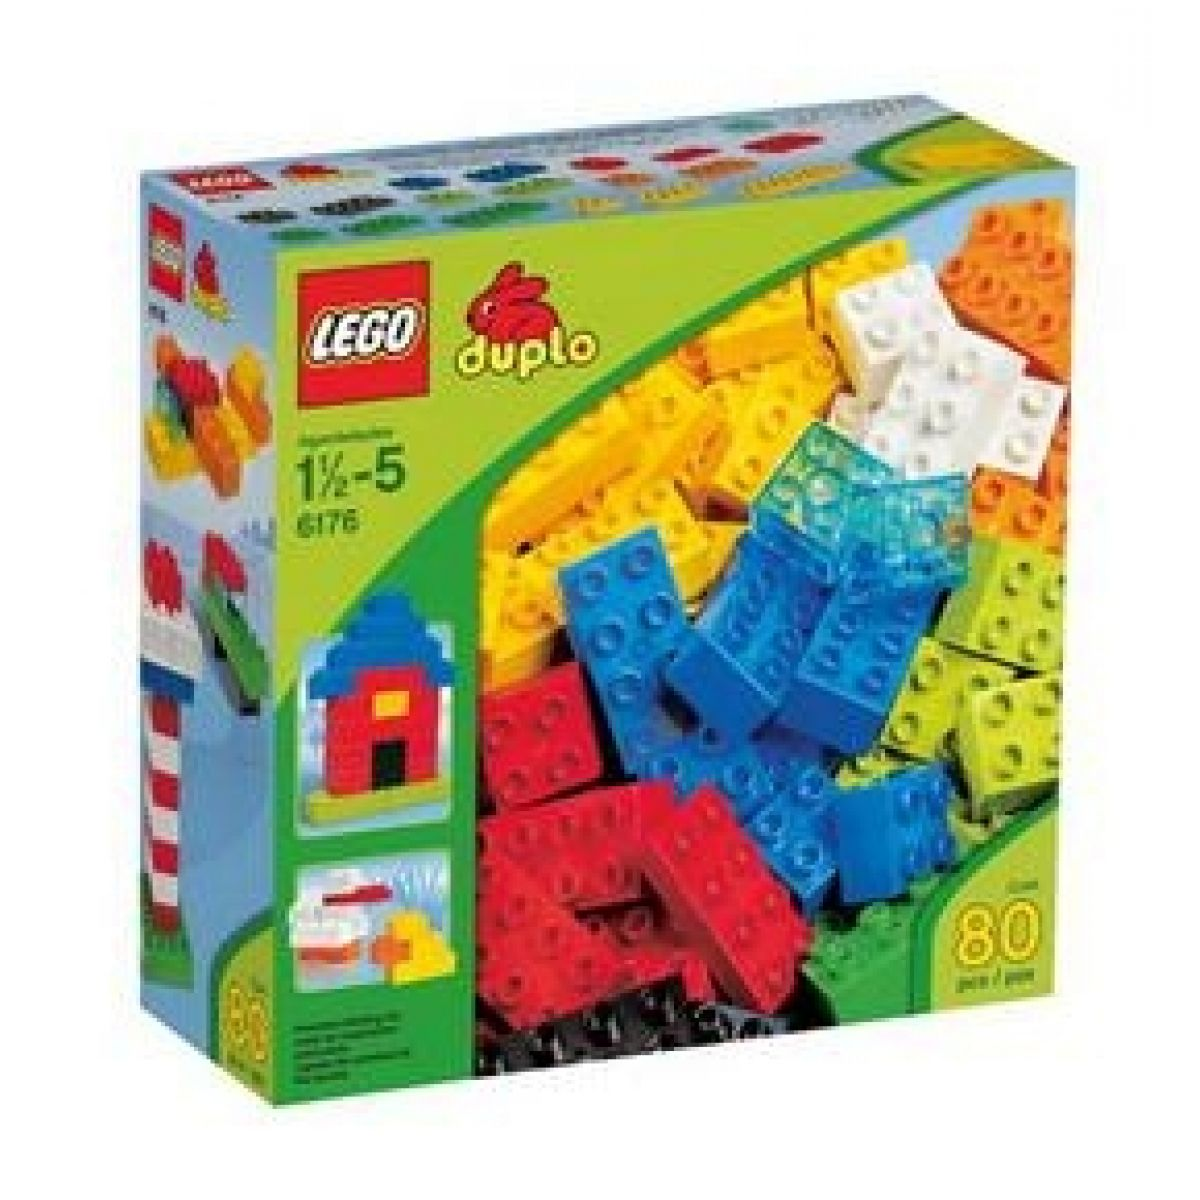 LEGO DUPLO 6176 Základní kostky sada Deluxe